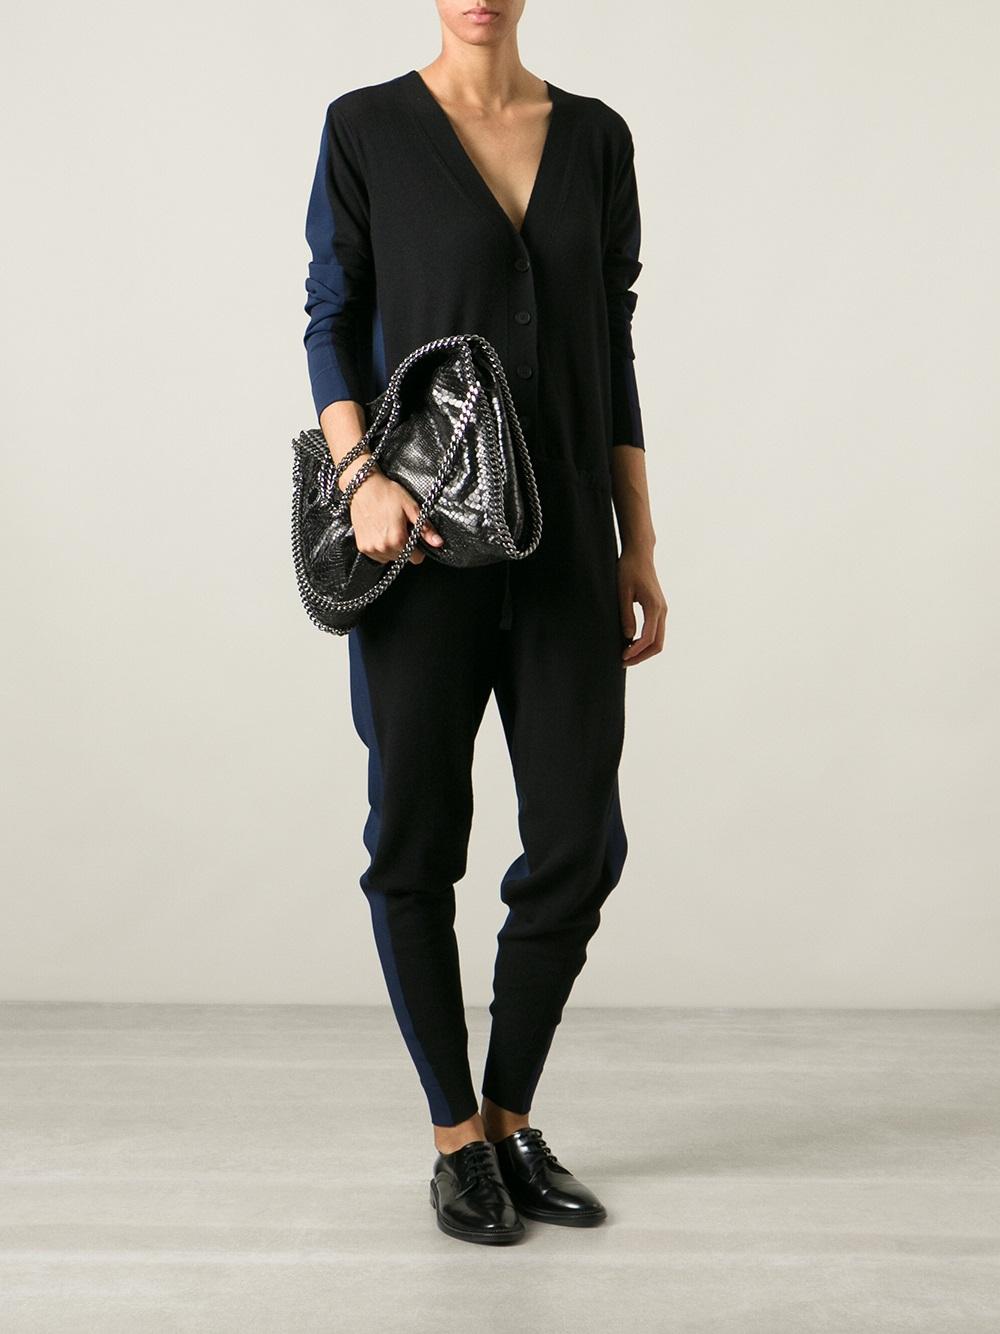 e8536c8bbc3a Lyst - Stella McCartney Falabella Python Effect Tote Bag in Black